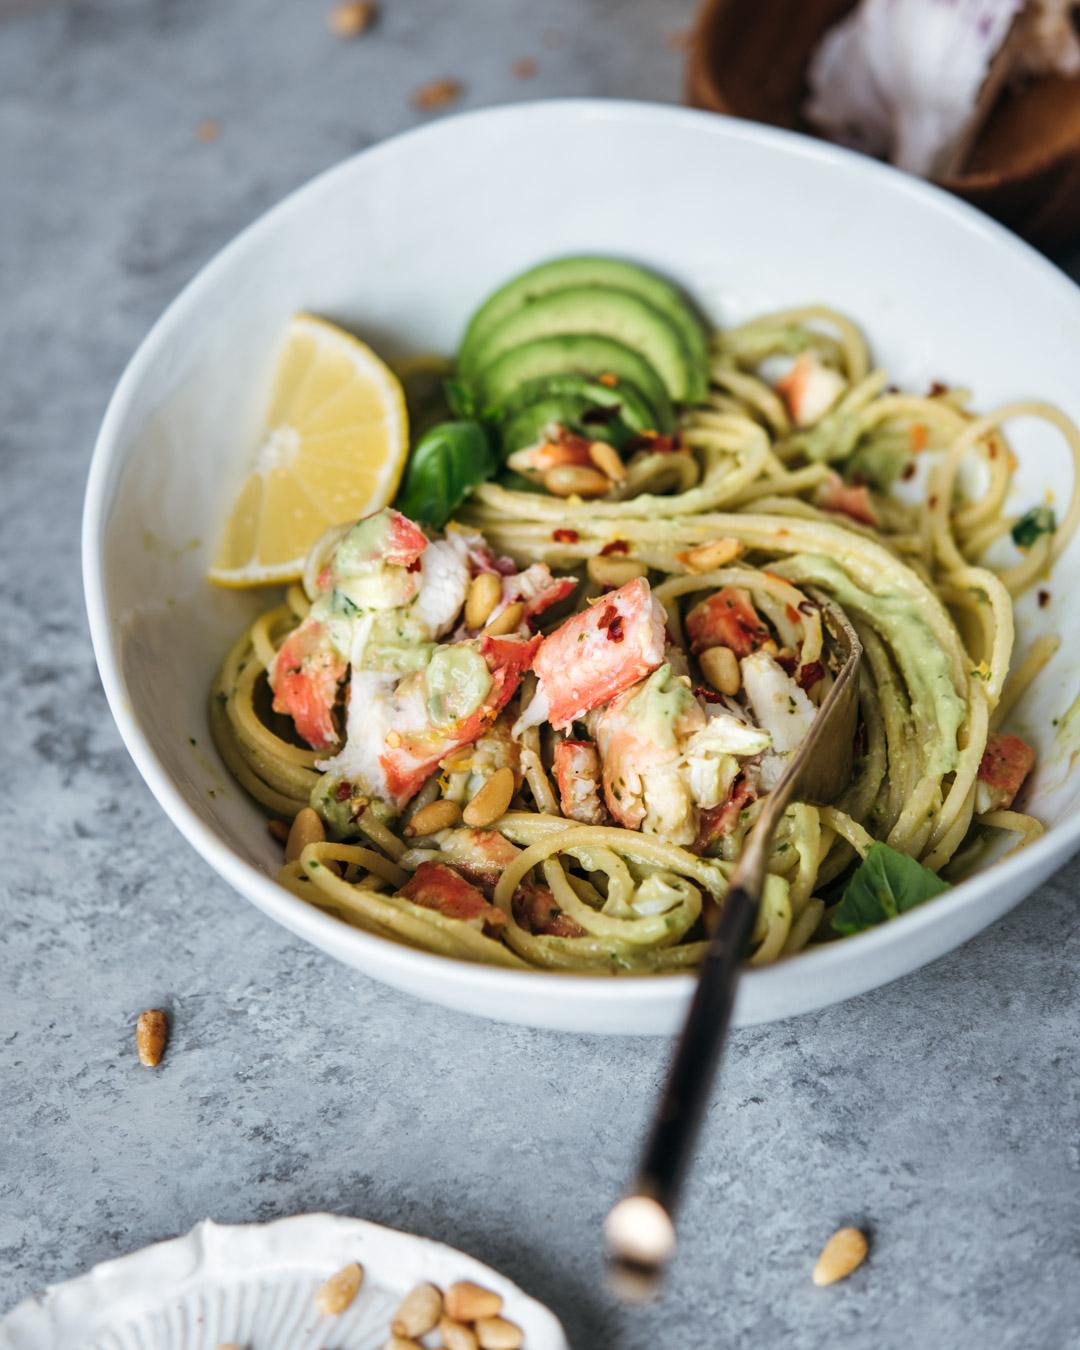 king crab avocado pesto pasta petrossian-0031-2.jpg